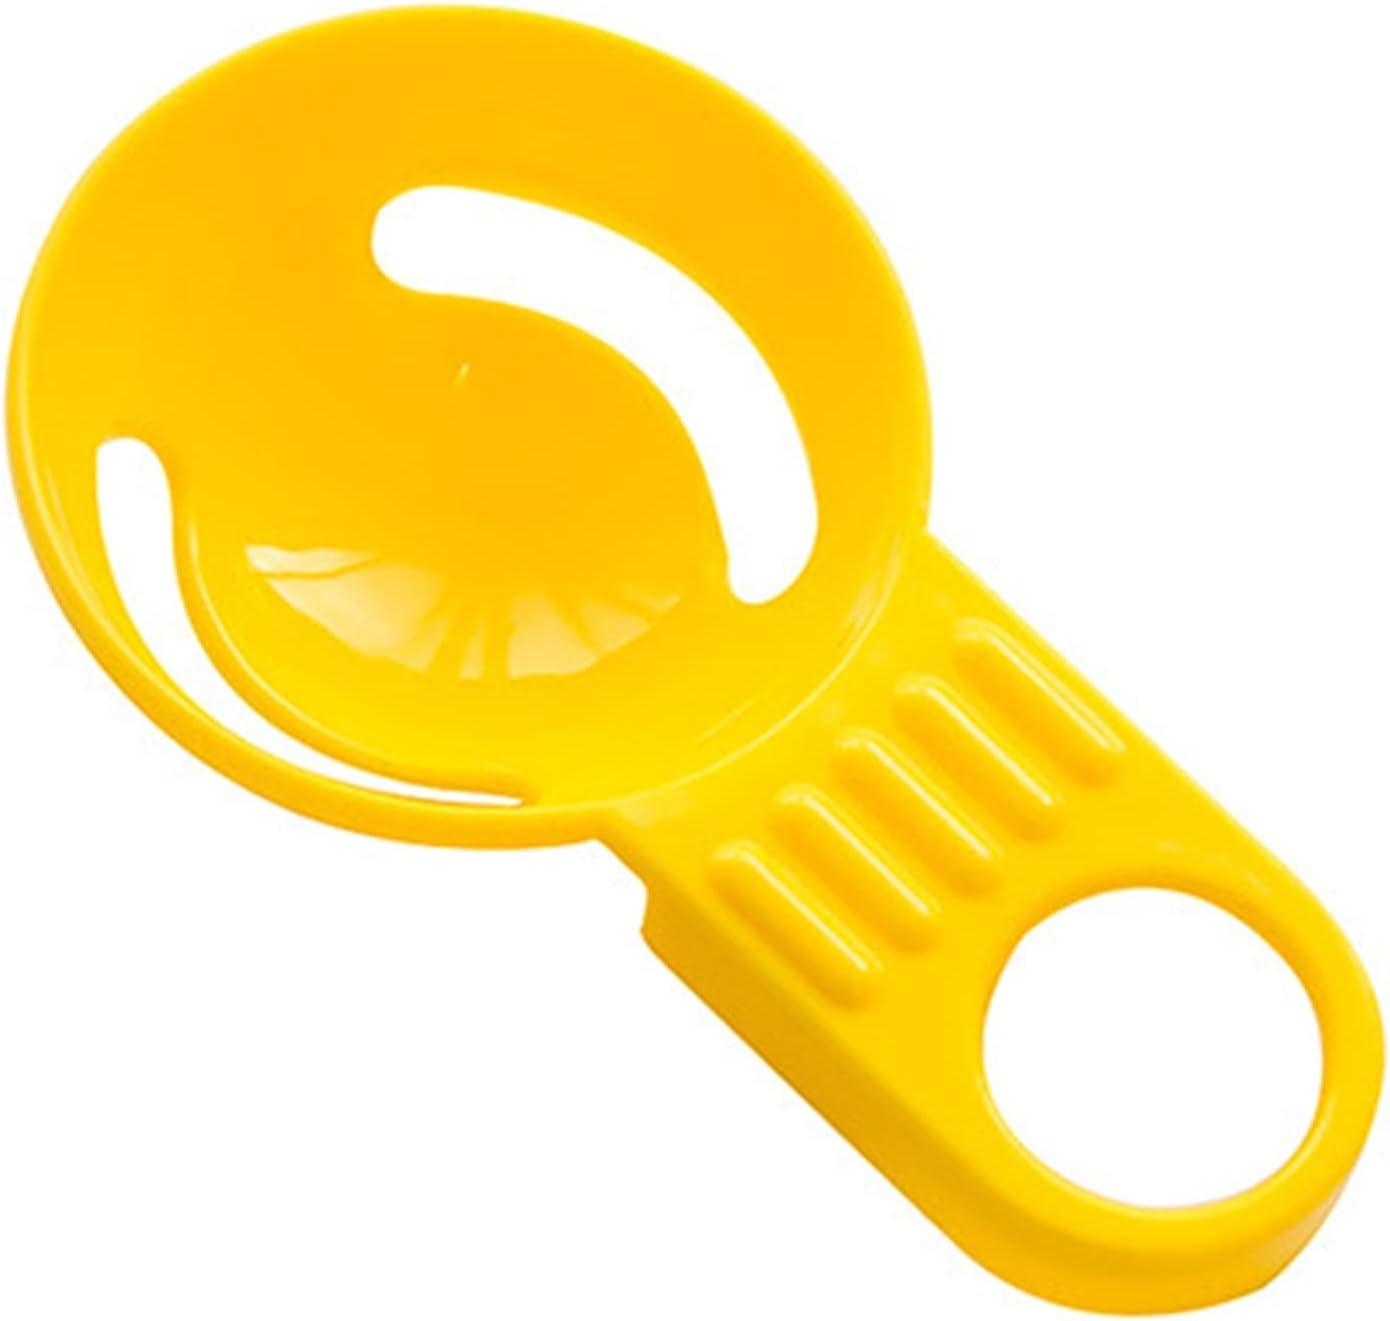 1Pcs Max 85% OFF Yolk Egg Separator Divider Sale item Accessories Sifting Gadg Kitchen